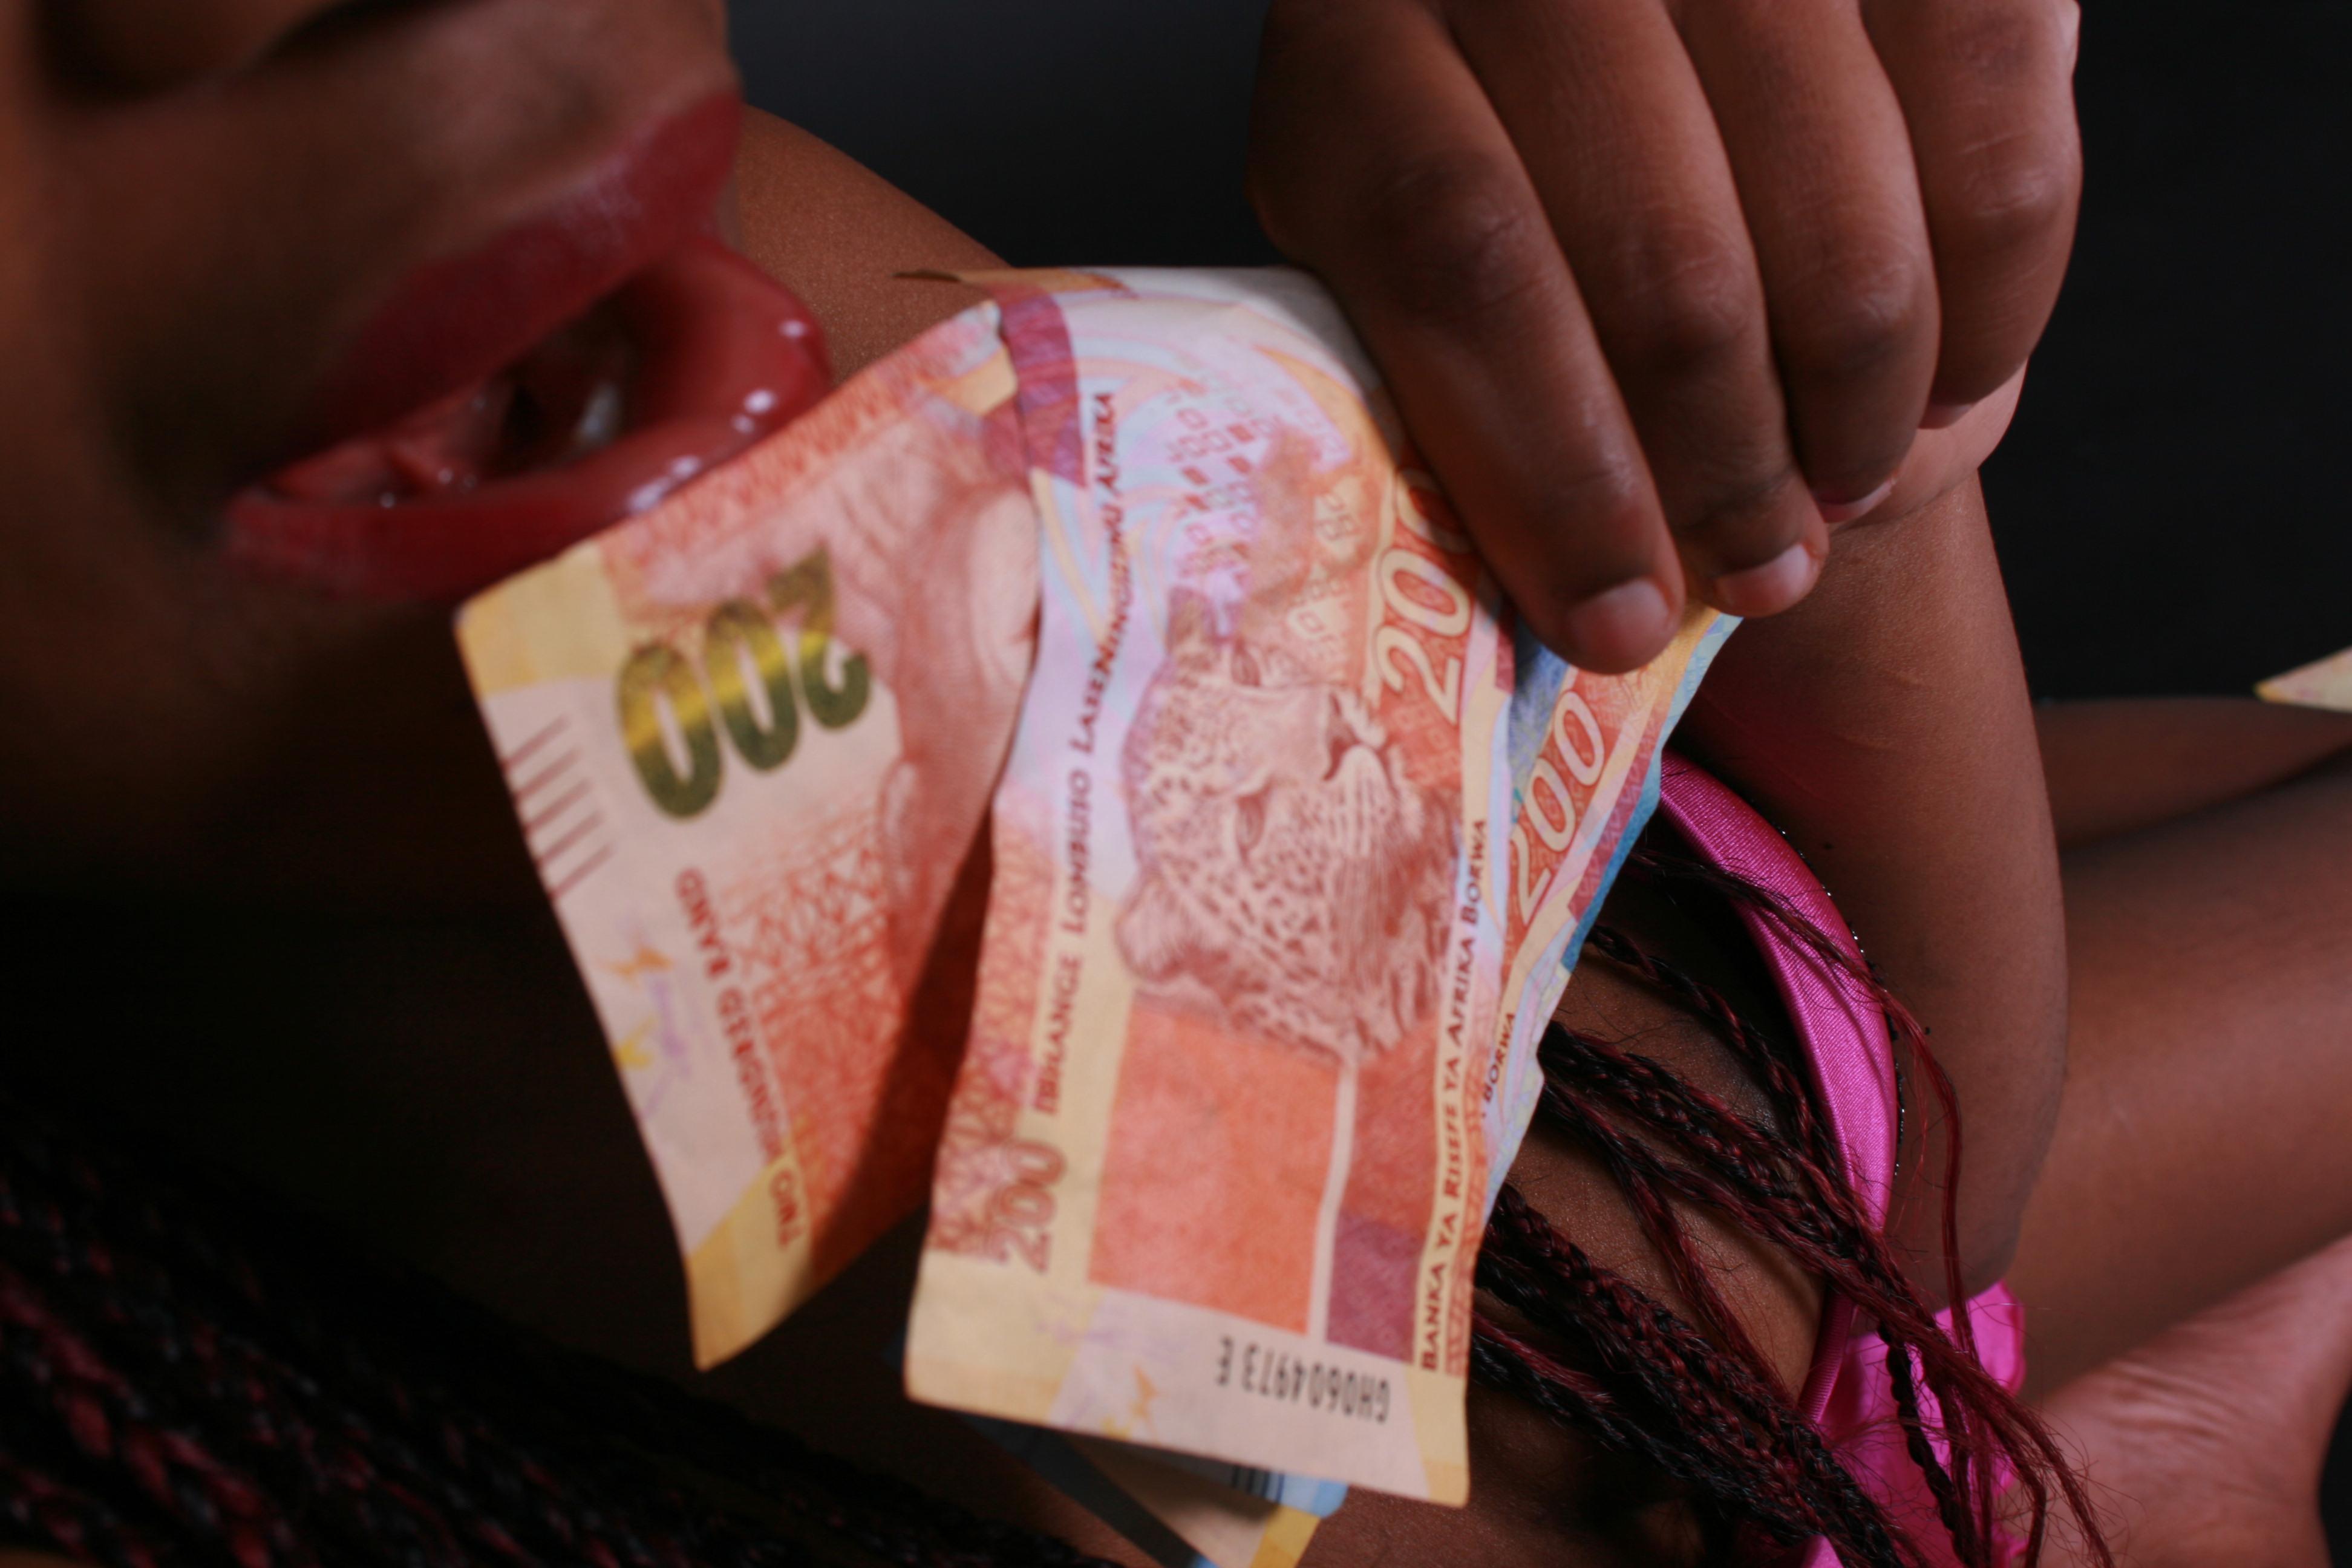 Strip club, Stripper, HOLAAfrica, IthongoMusings, Sex Work, African Ssexualities